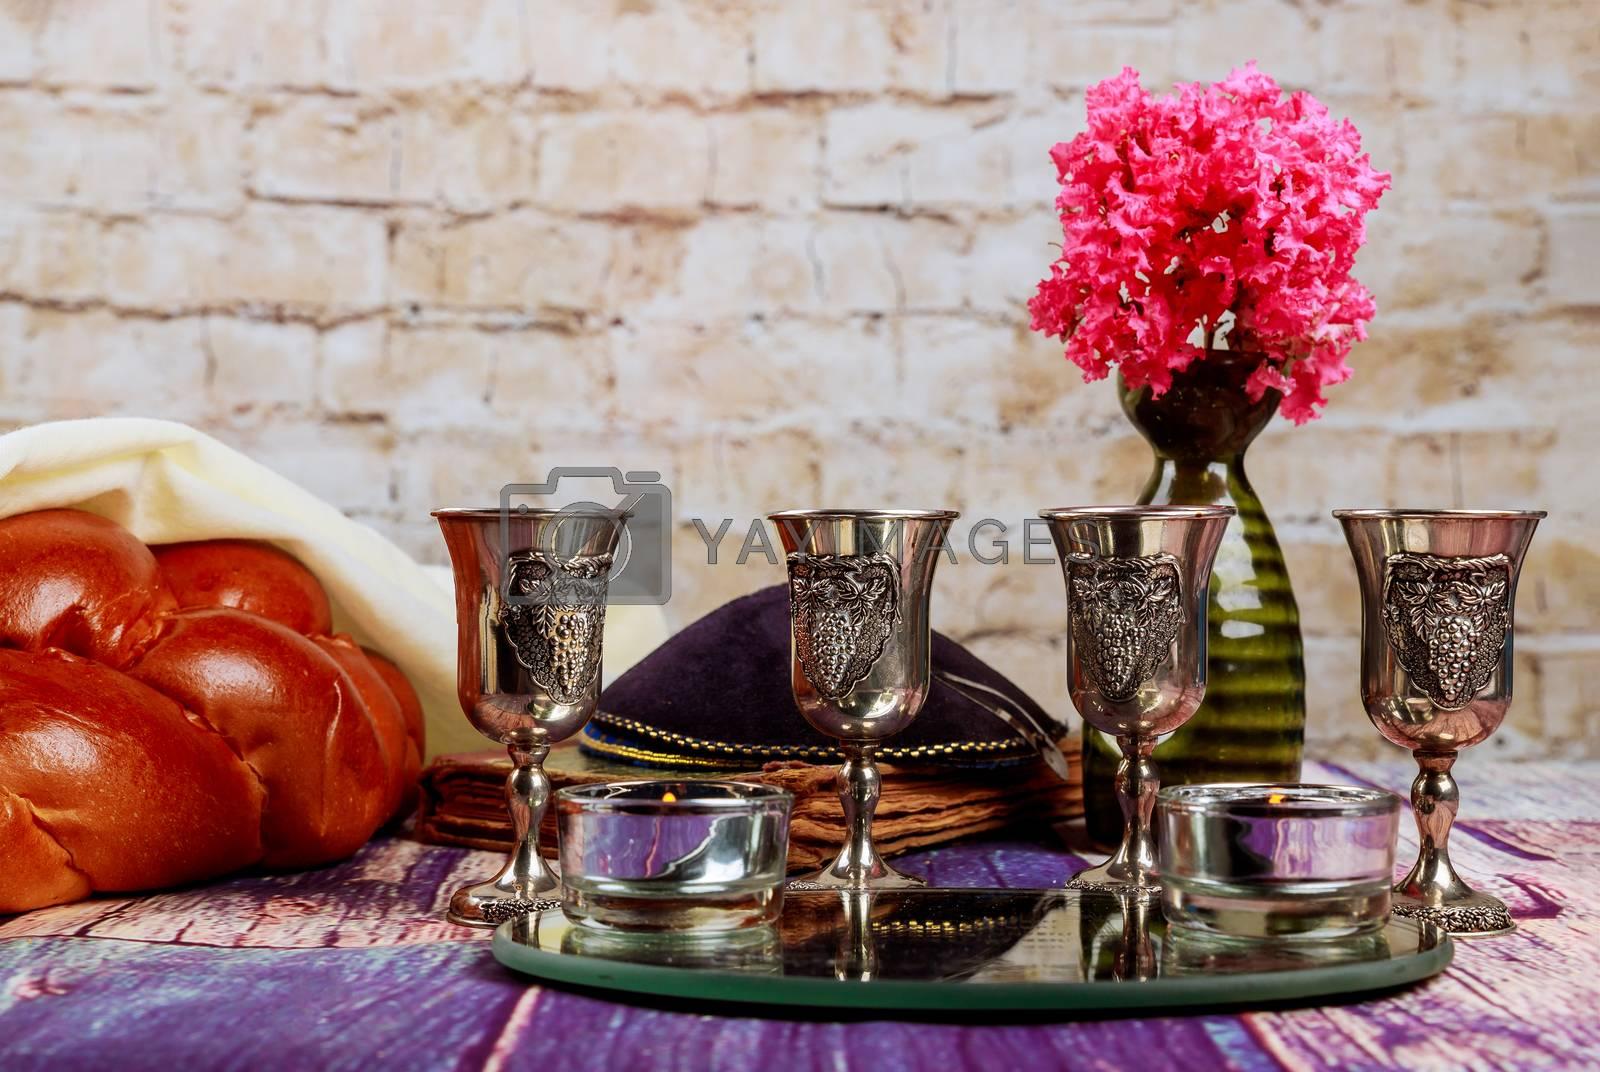 Traditional Jewish Sabbath Shalom ritual fresh challah bread with kiddush four cup of red kosher wine